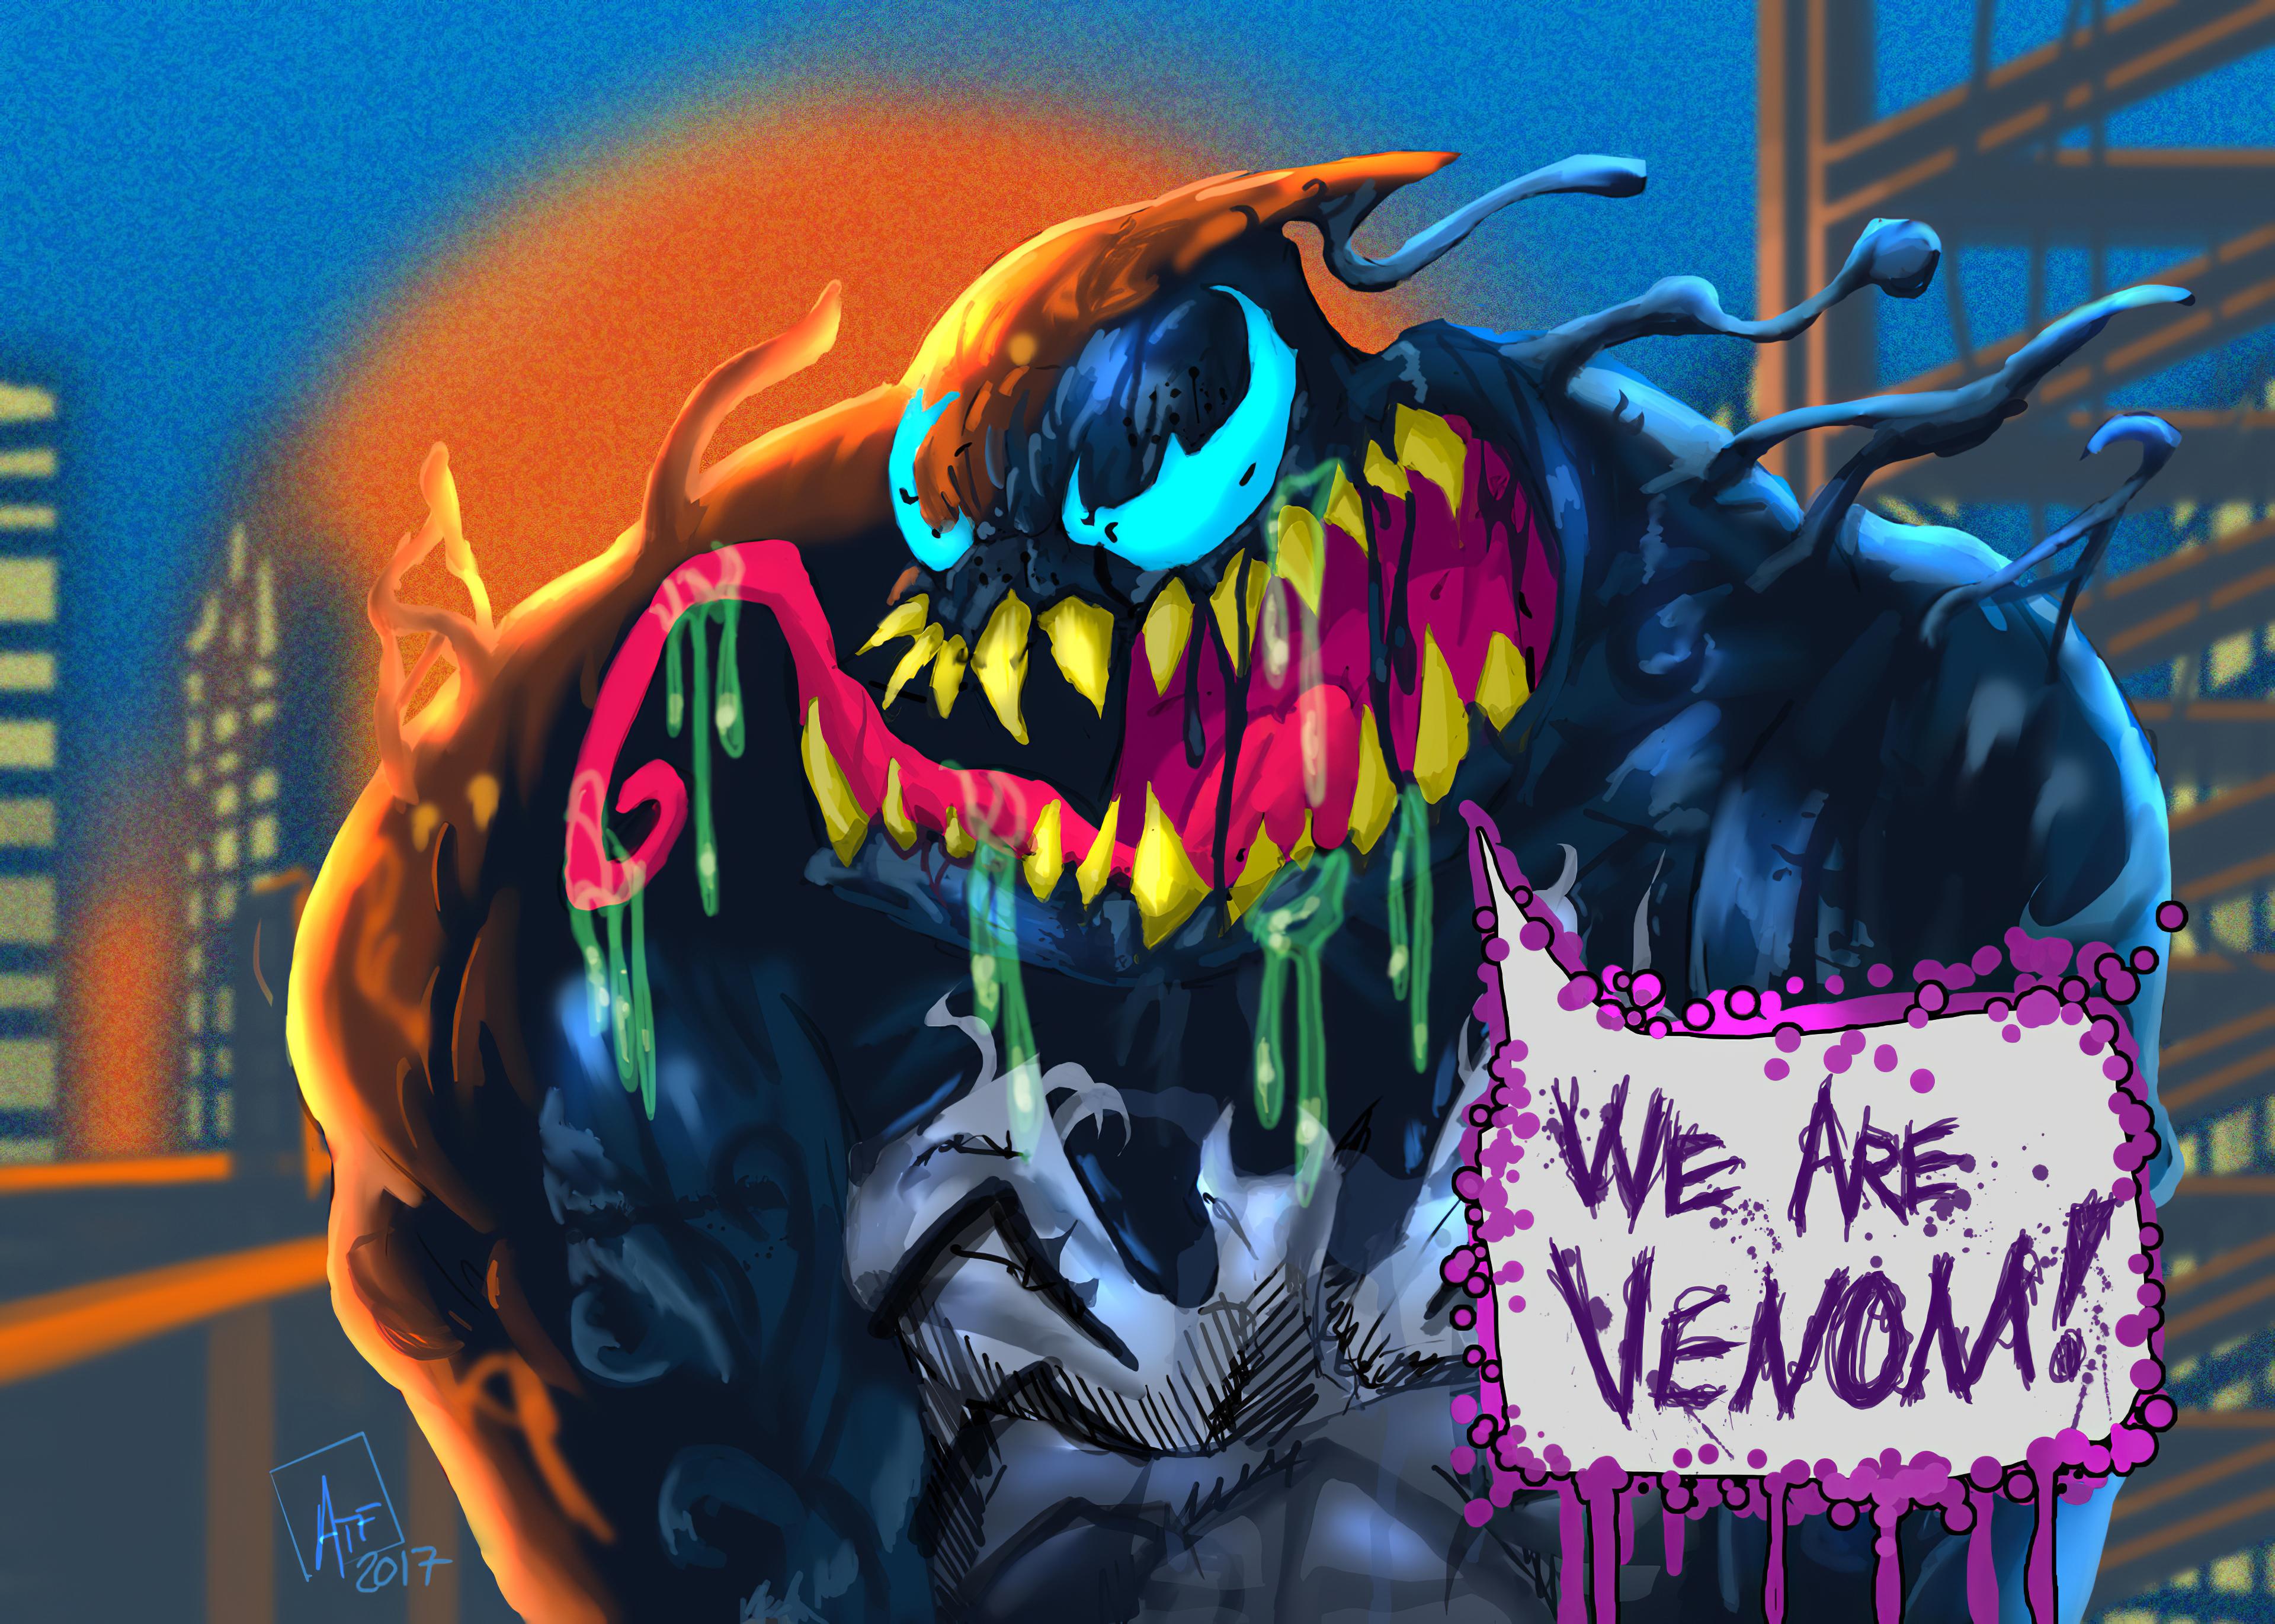 venom fullcolor art 1576092665 - Venom FullColor Art - venom wallpaper phone hd 4k, Venom wallpaper 4k hd, venom wallapper hd 4k, 4k wallpaper venom